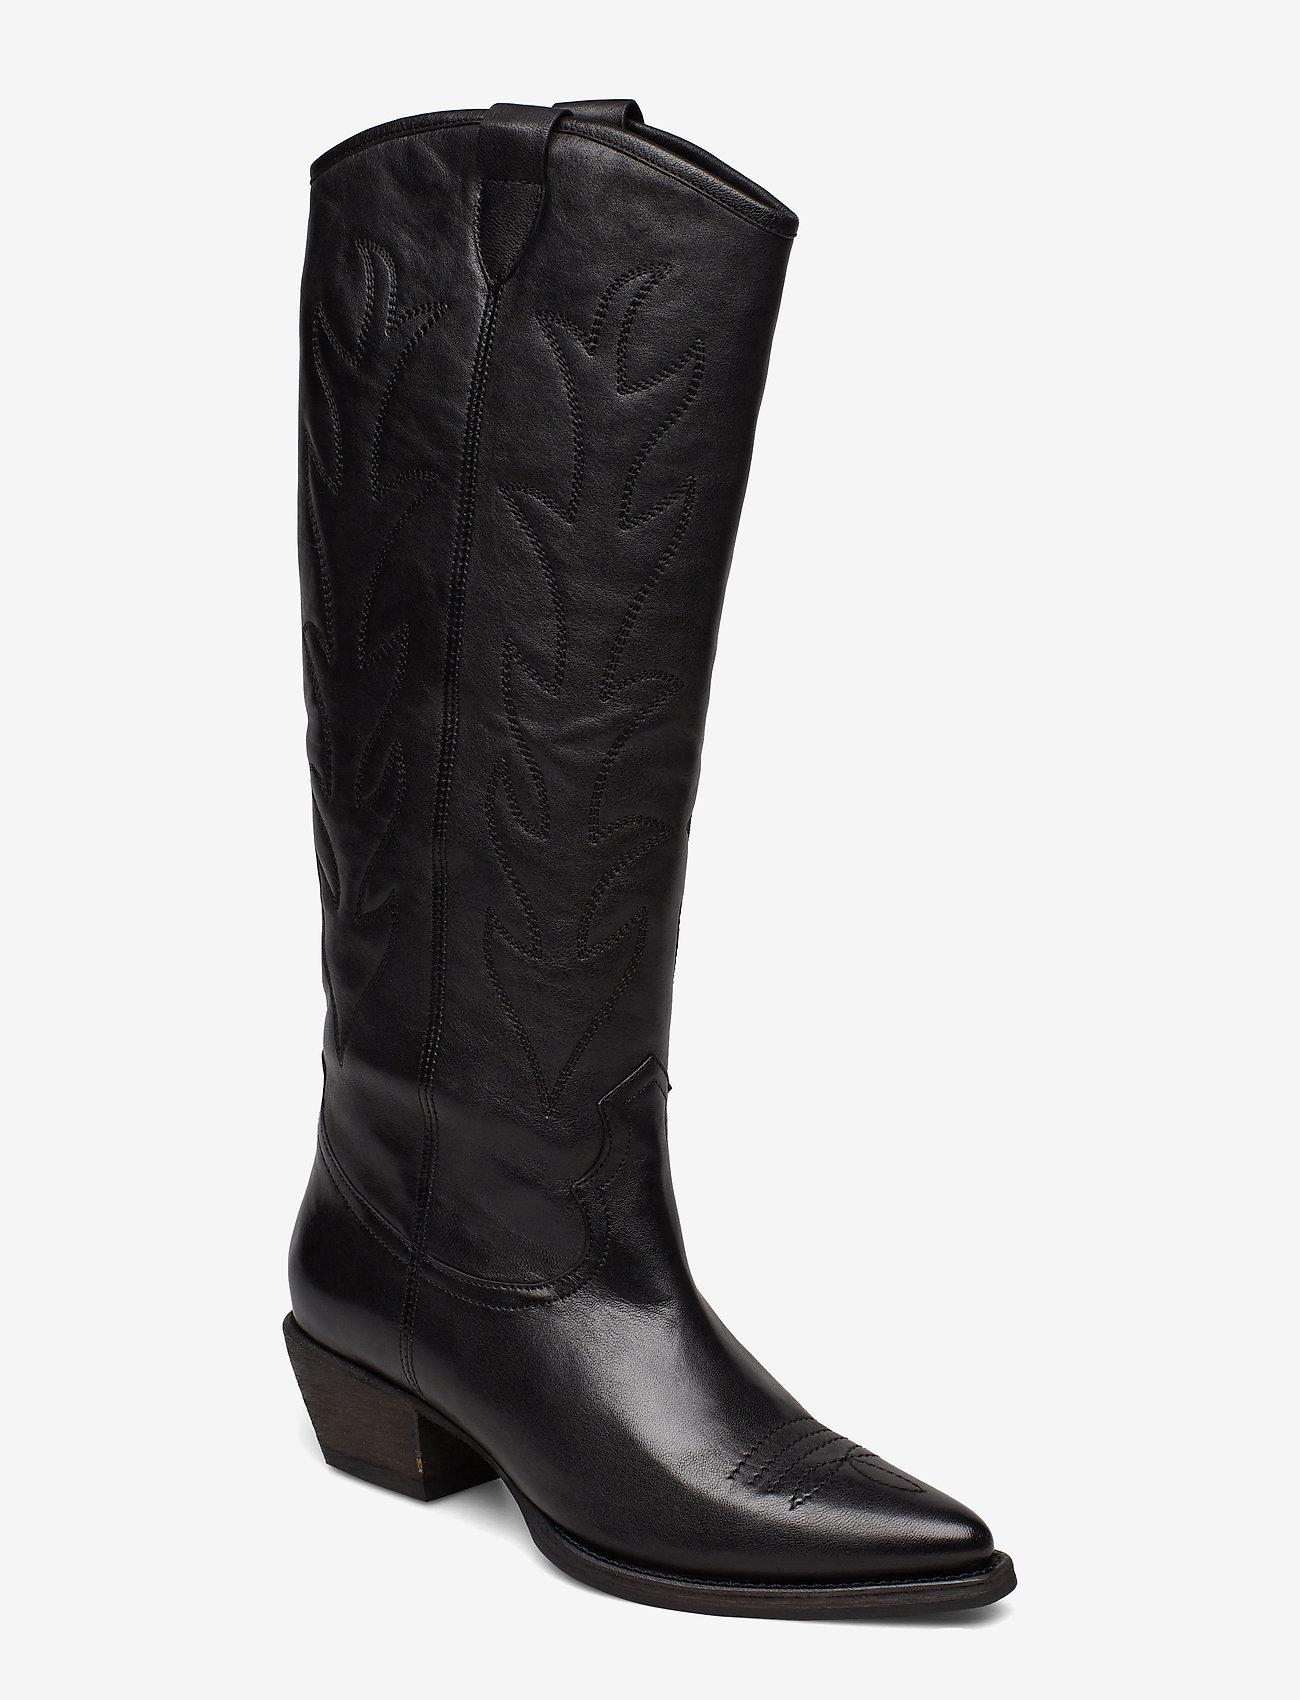 Billi Bi - Long Boots 3614 - pitkävartiset saappaat - black nappa 70 Å